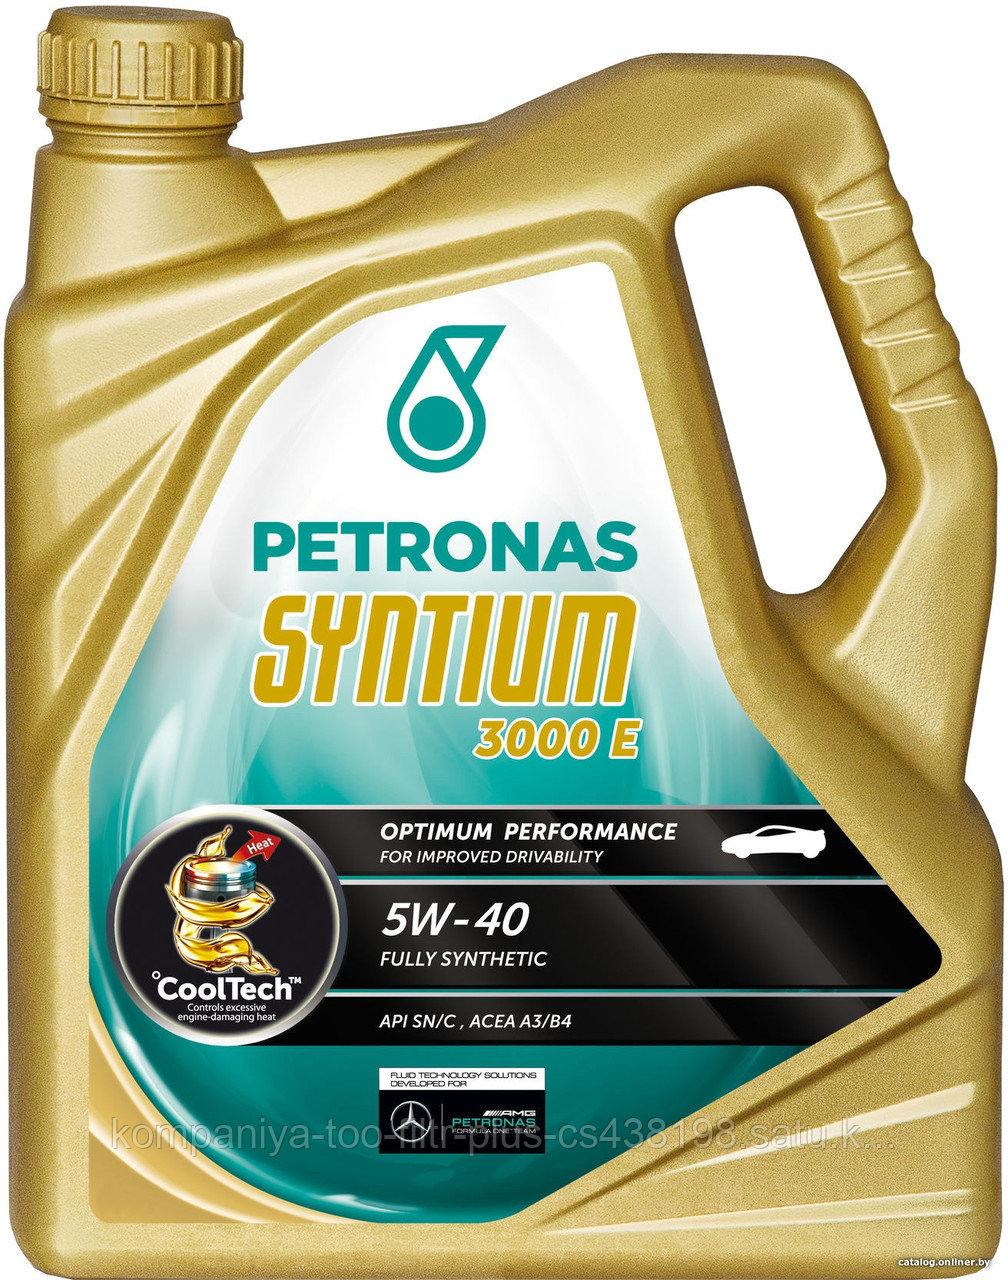 PETRONAS SYNTIUM 3000 E 5W-40 5л